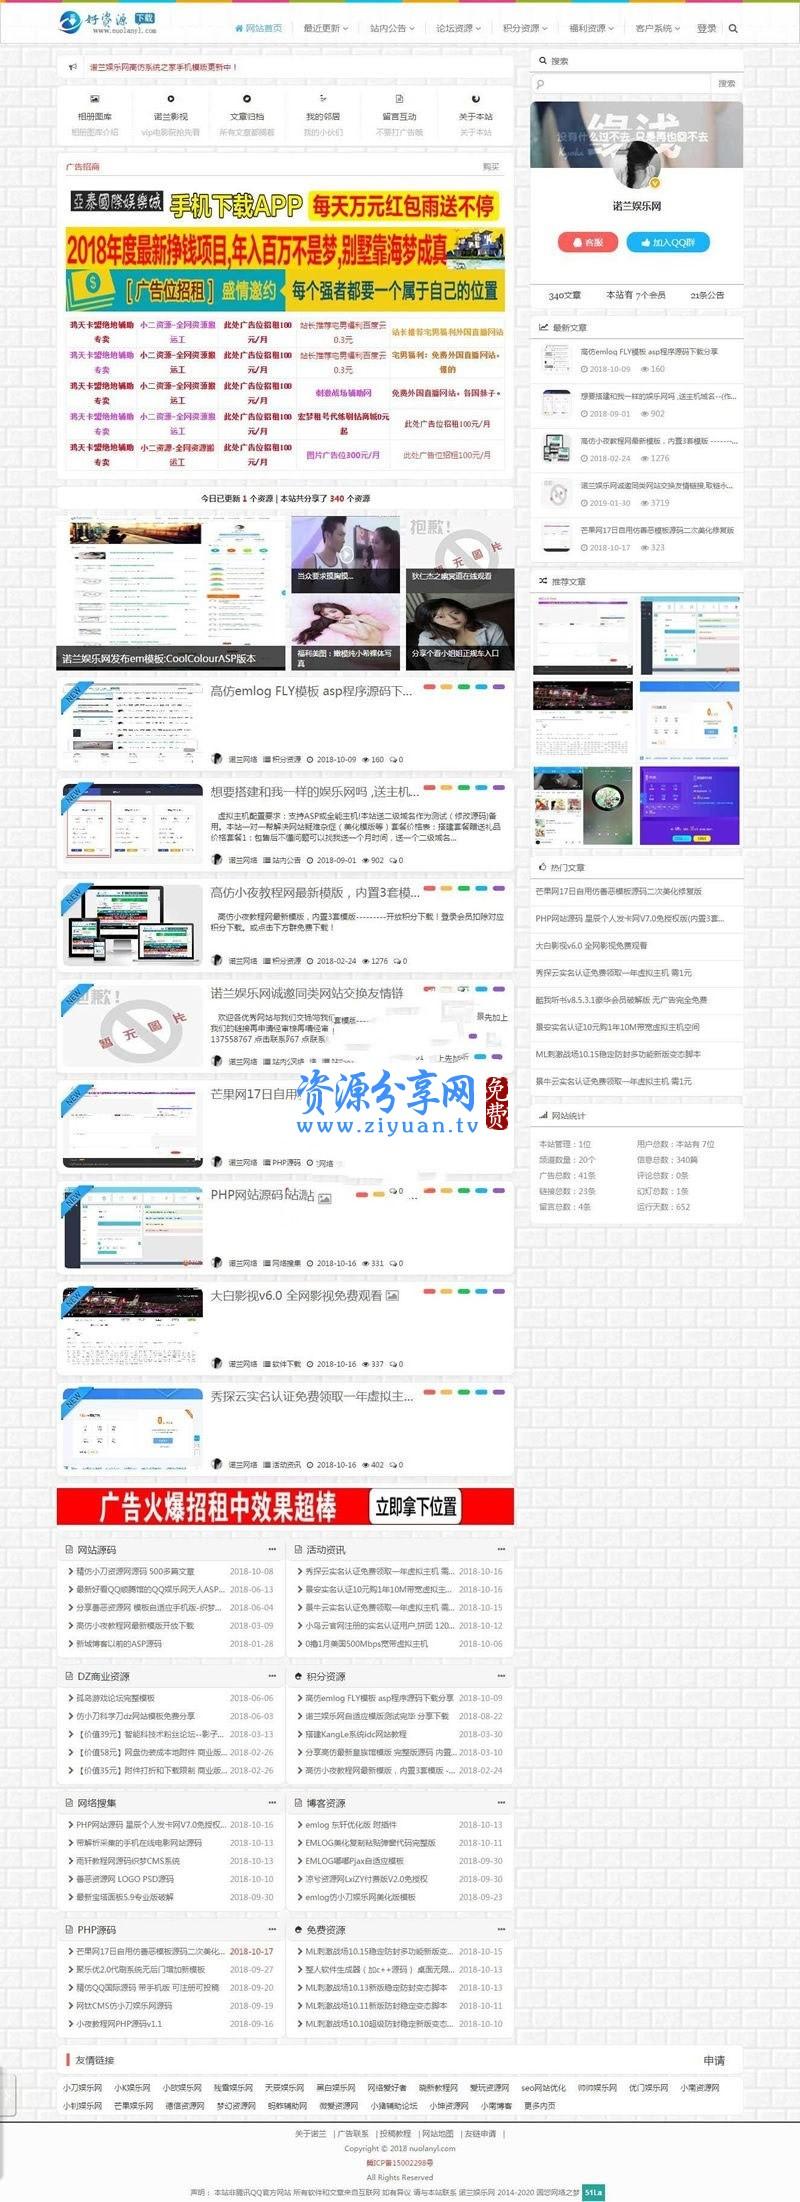 Emlog 教程资源站源码仿 EMLOGfly 模板